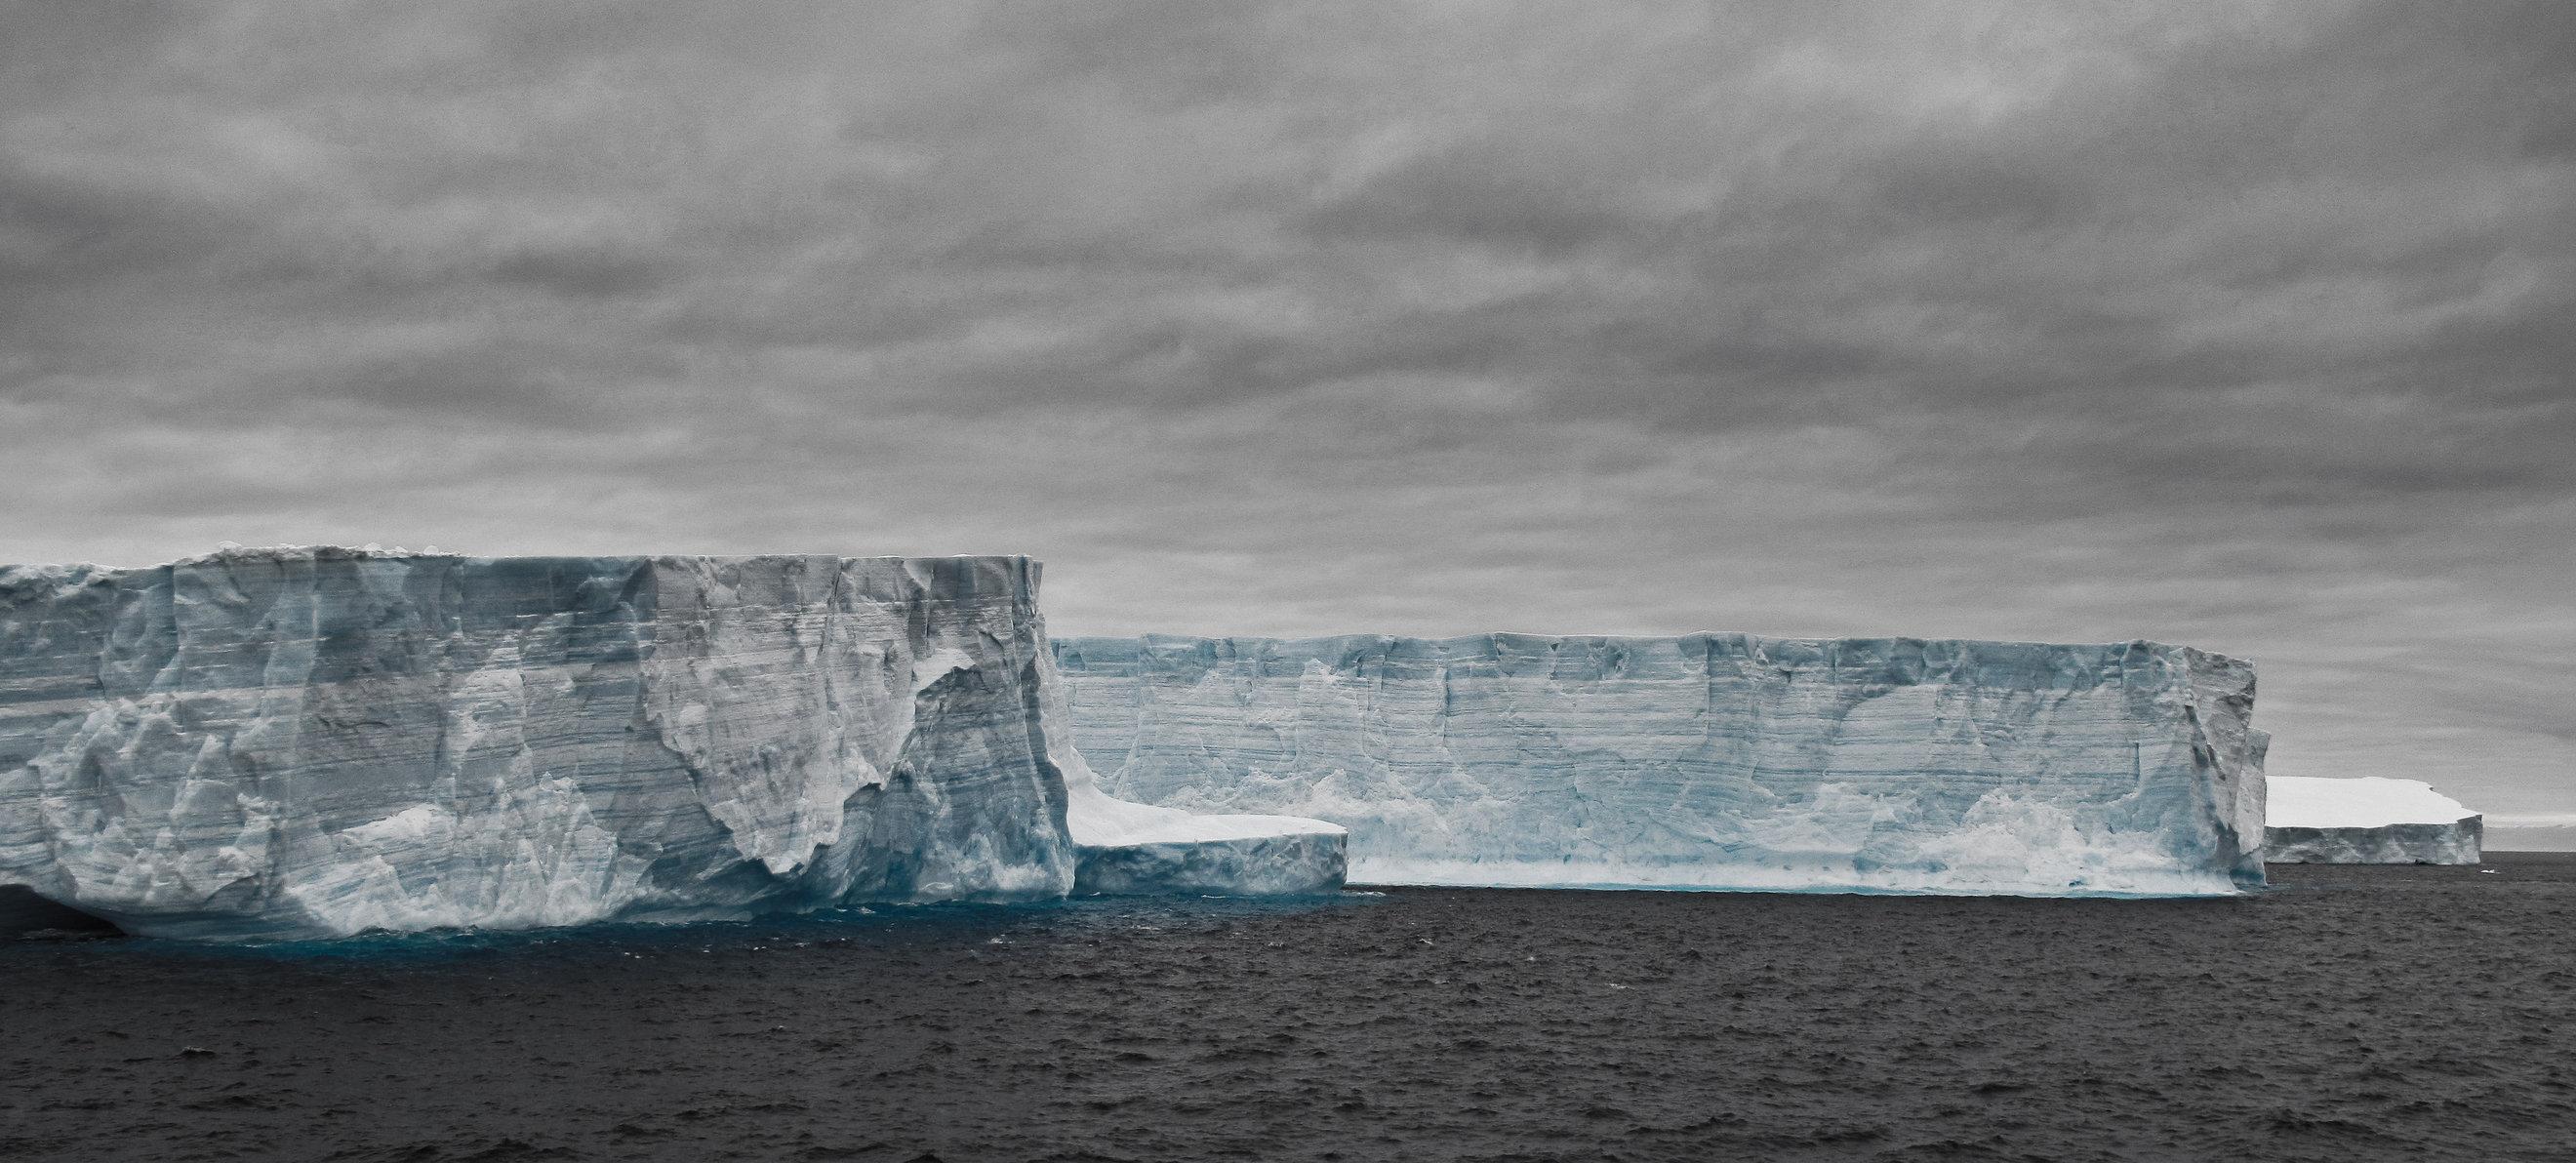 Icebergs-Antarctic Sound, Antarctica.jpg